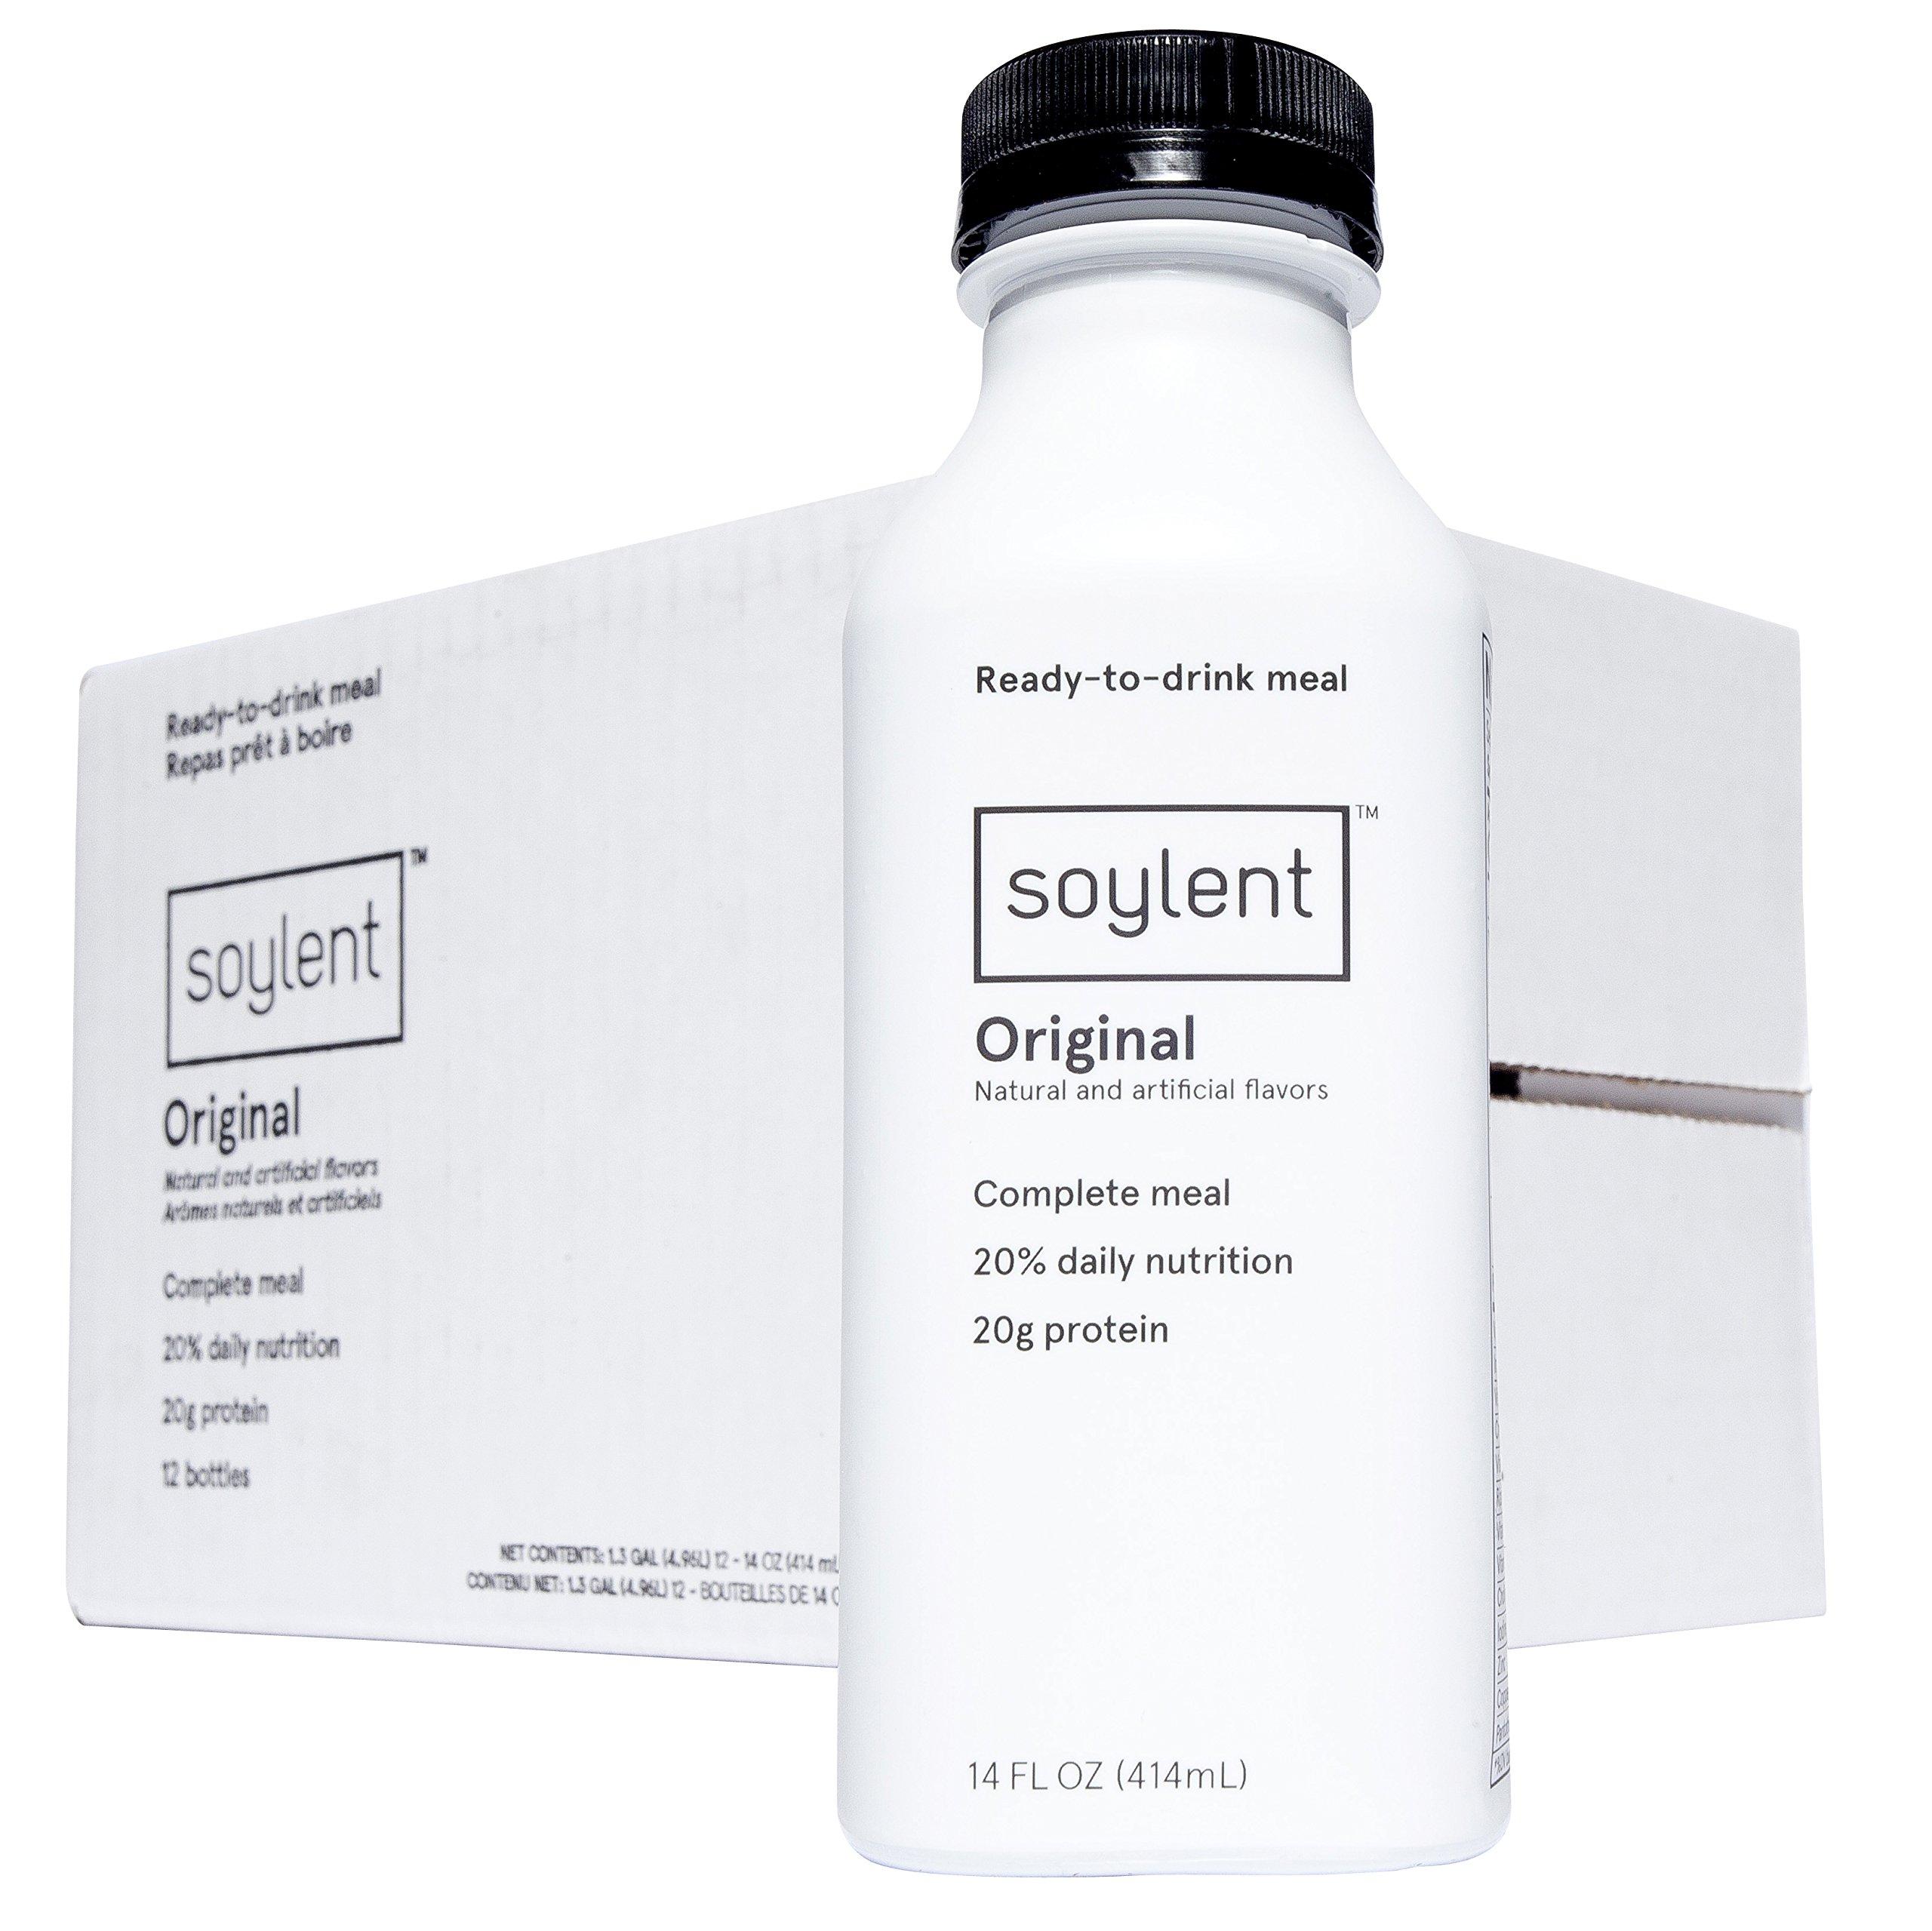 Soylent Meal Replacement Drink, Original, 14 oz Bottles, 12 Pack